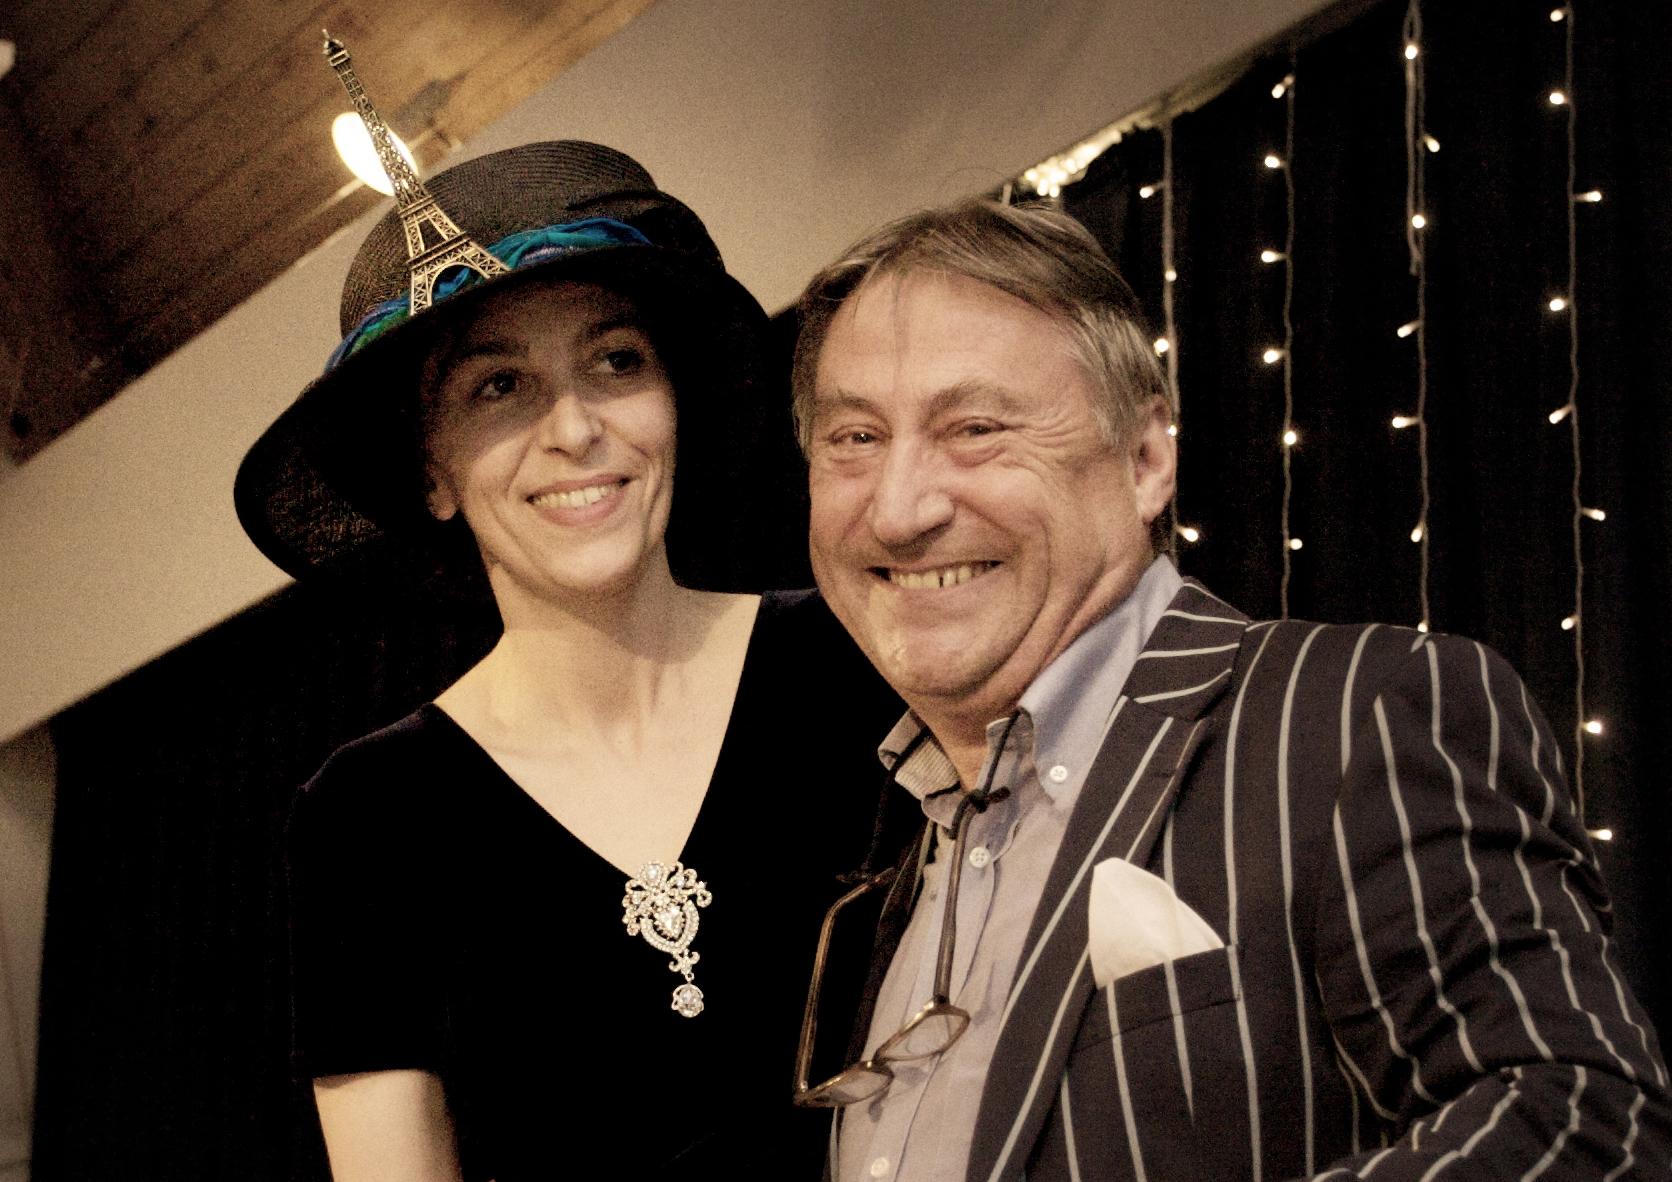 Nathalie Banaigs and David Selves (Master of Ceremony)